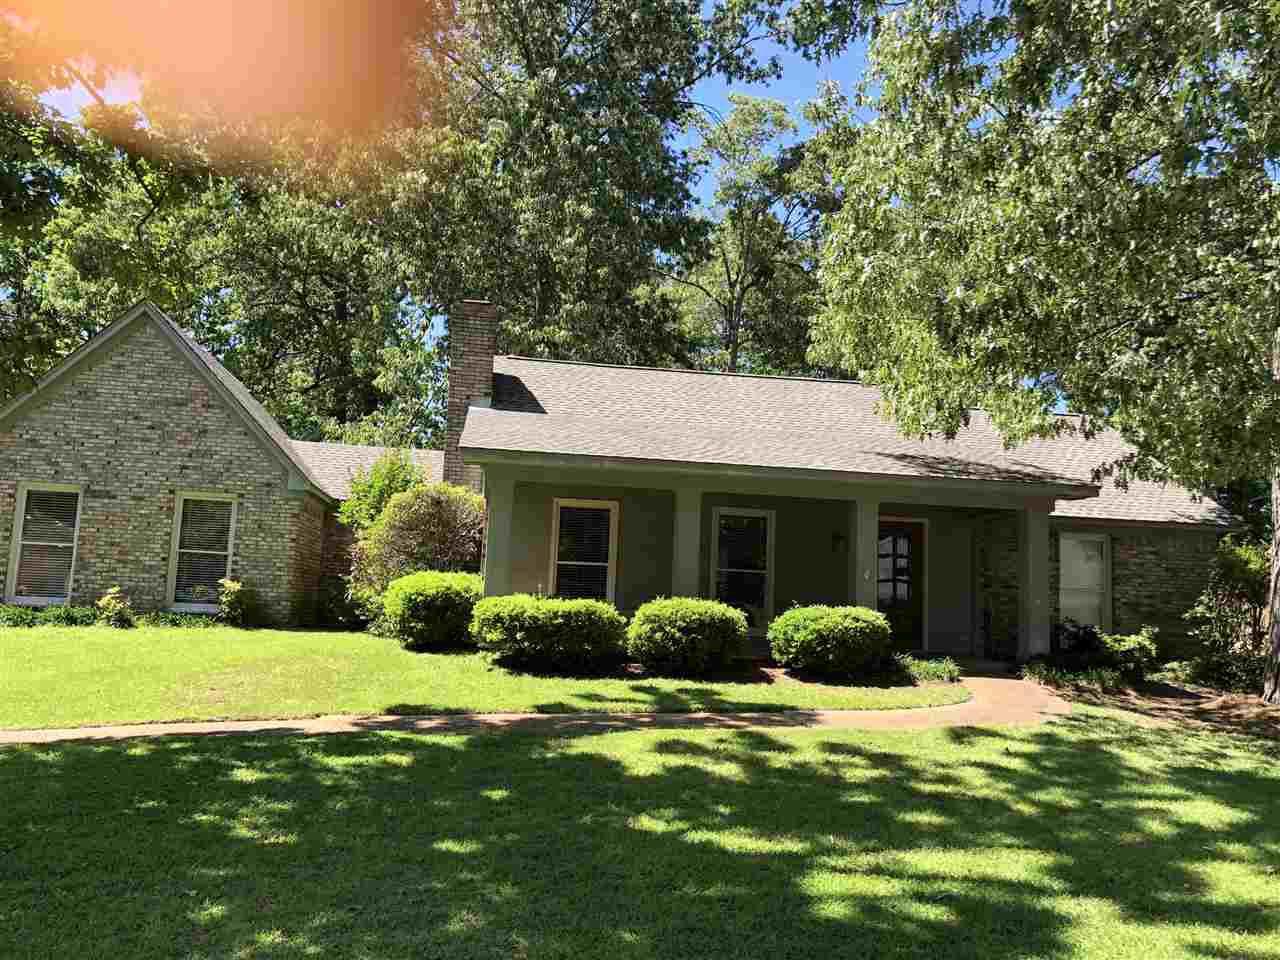 103 Parkway Cv, Brandon, MS 39047 - Estimate and Home Details   Trulia